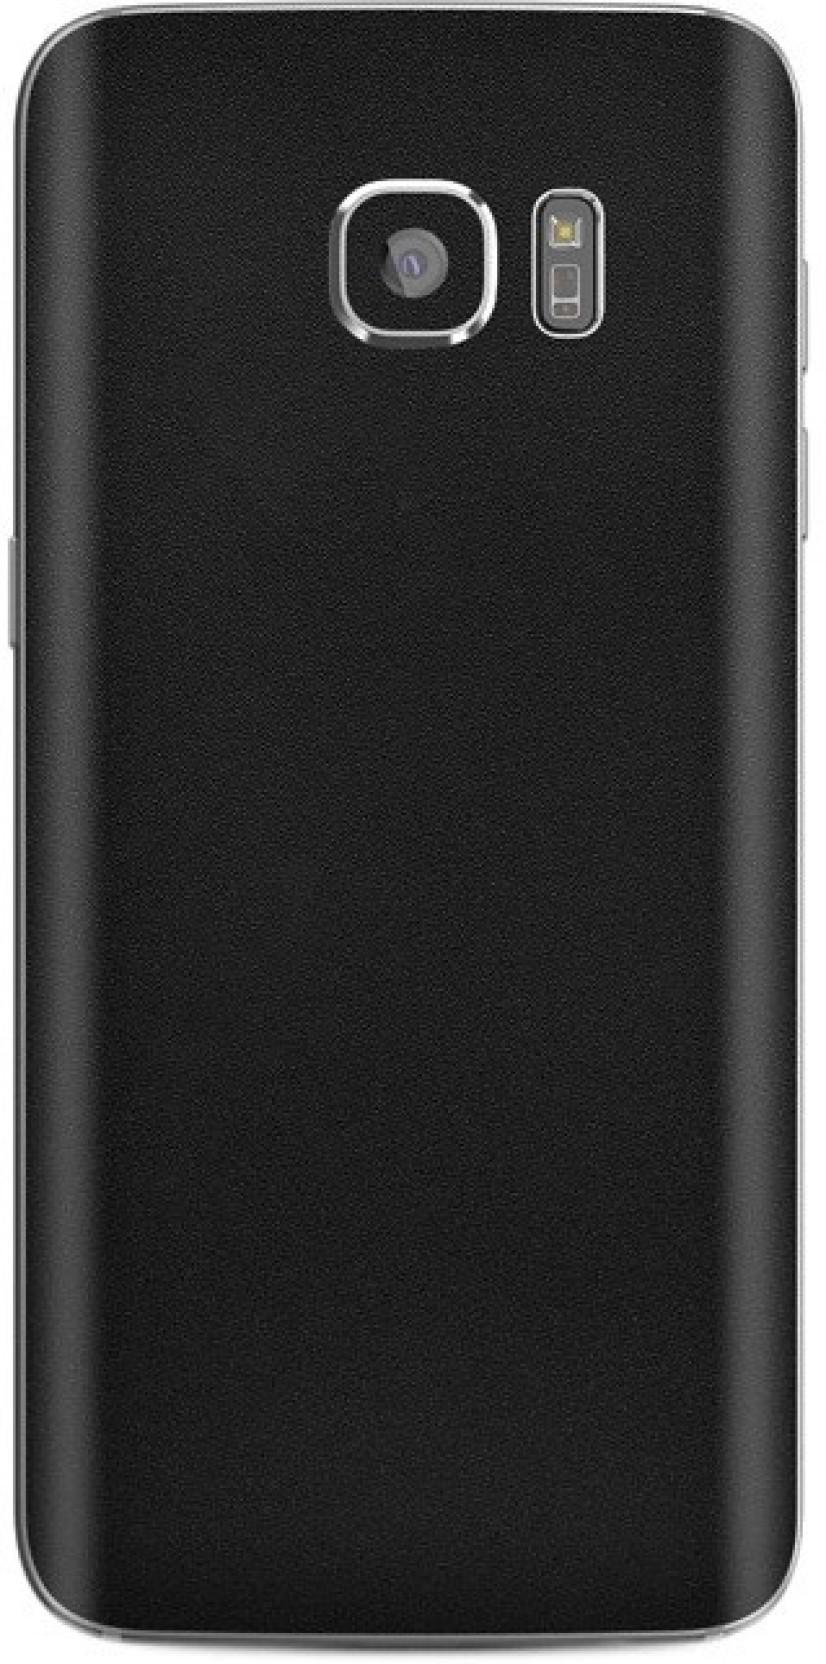 Skinnova Sam S7 Edge Ssbk Samsung Galaxy Mobile Skin Price Baby Ultra Thin Hard Case For Black Share